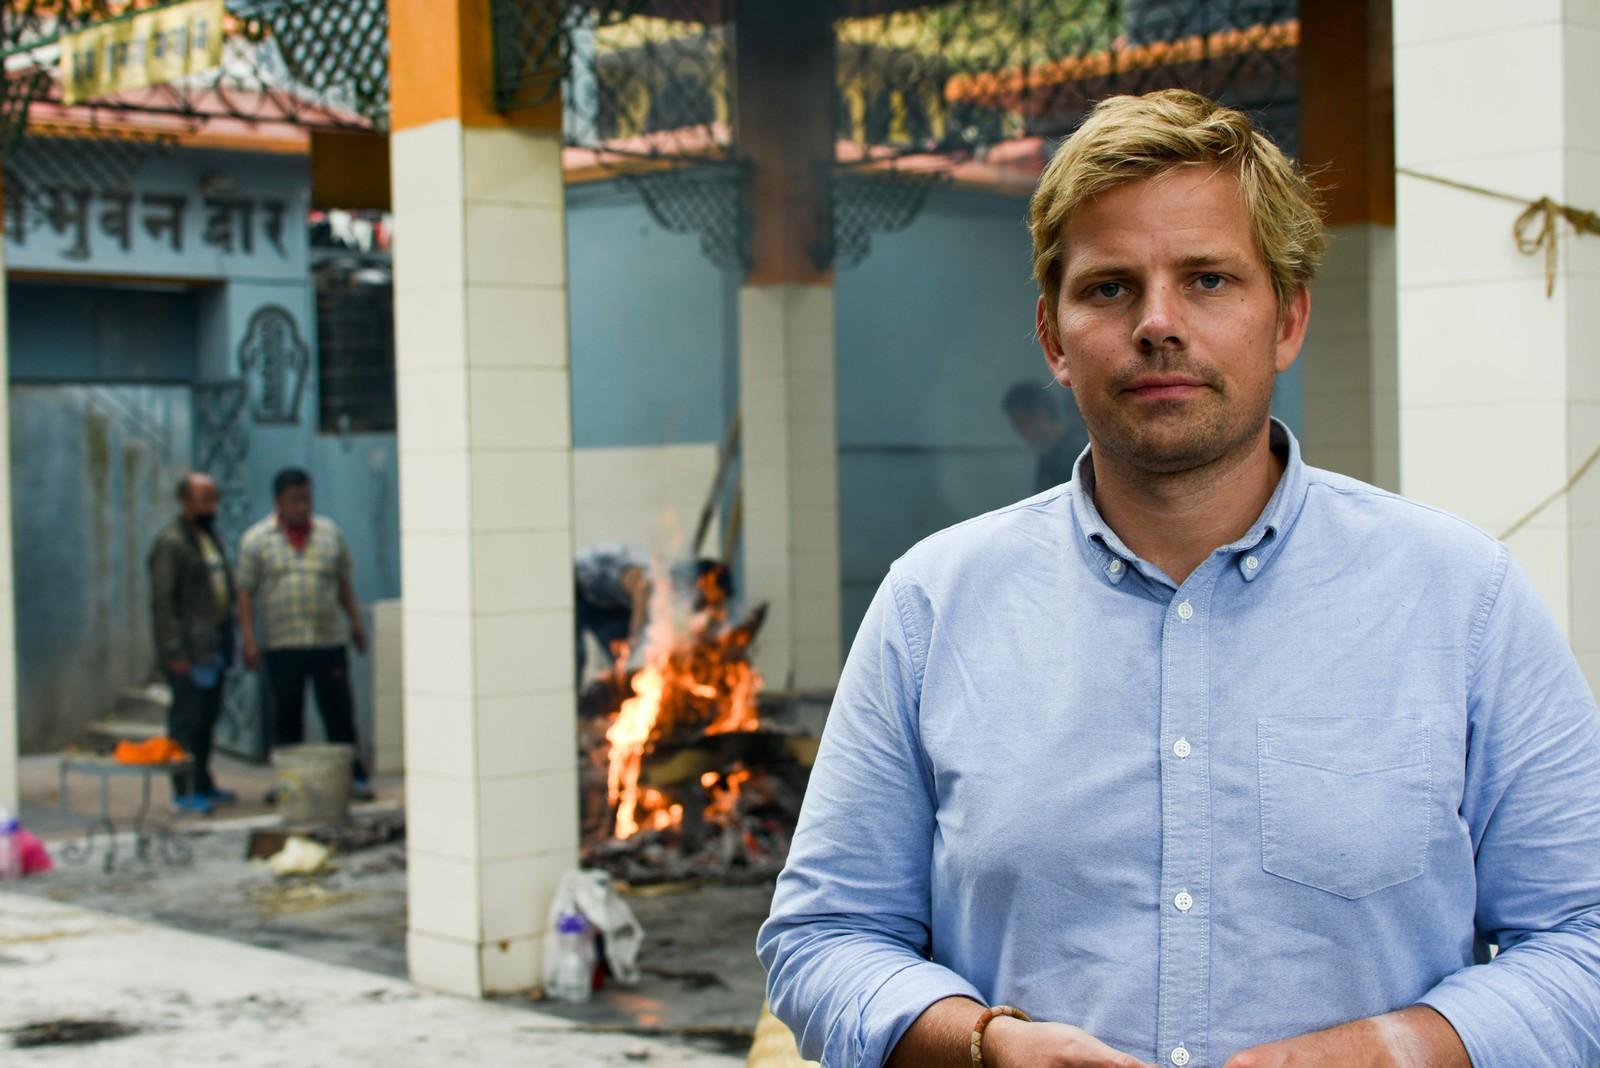 Peter Svaar foran tempelet der de brenner likene.